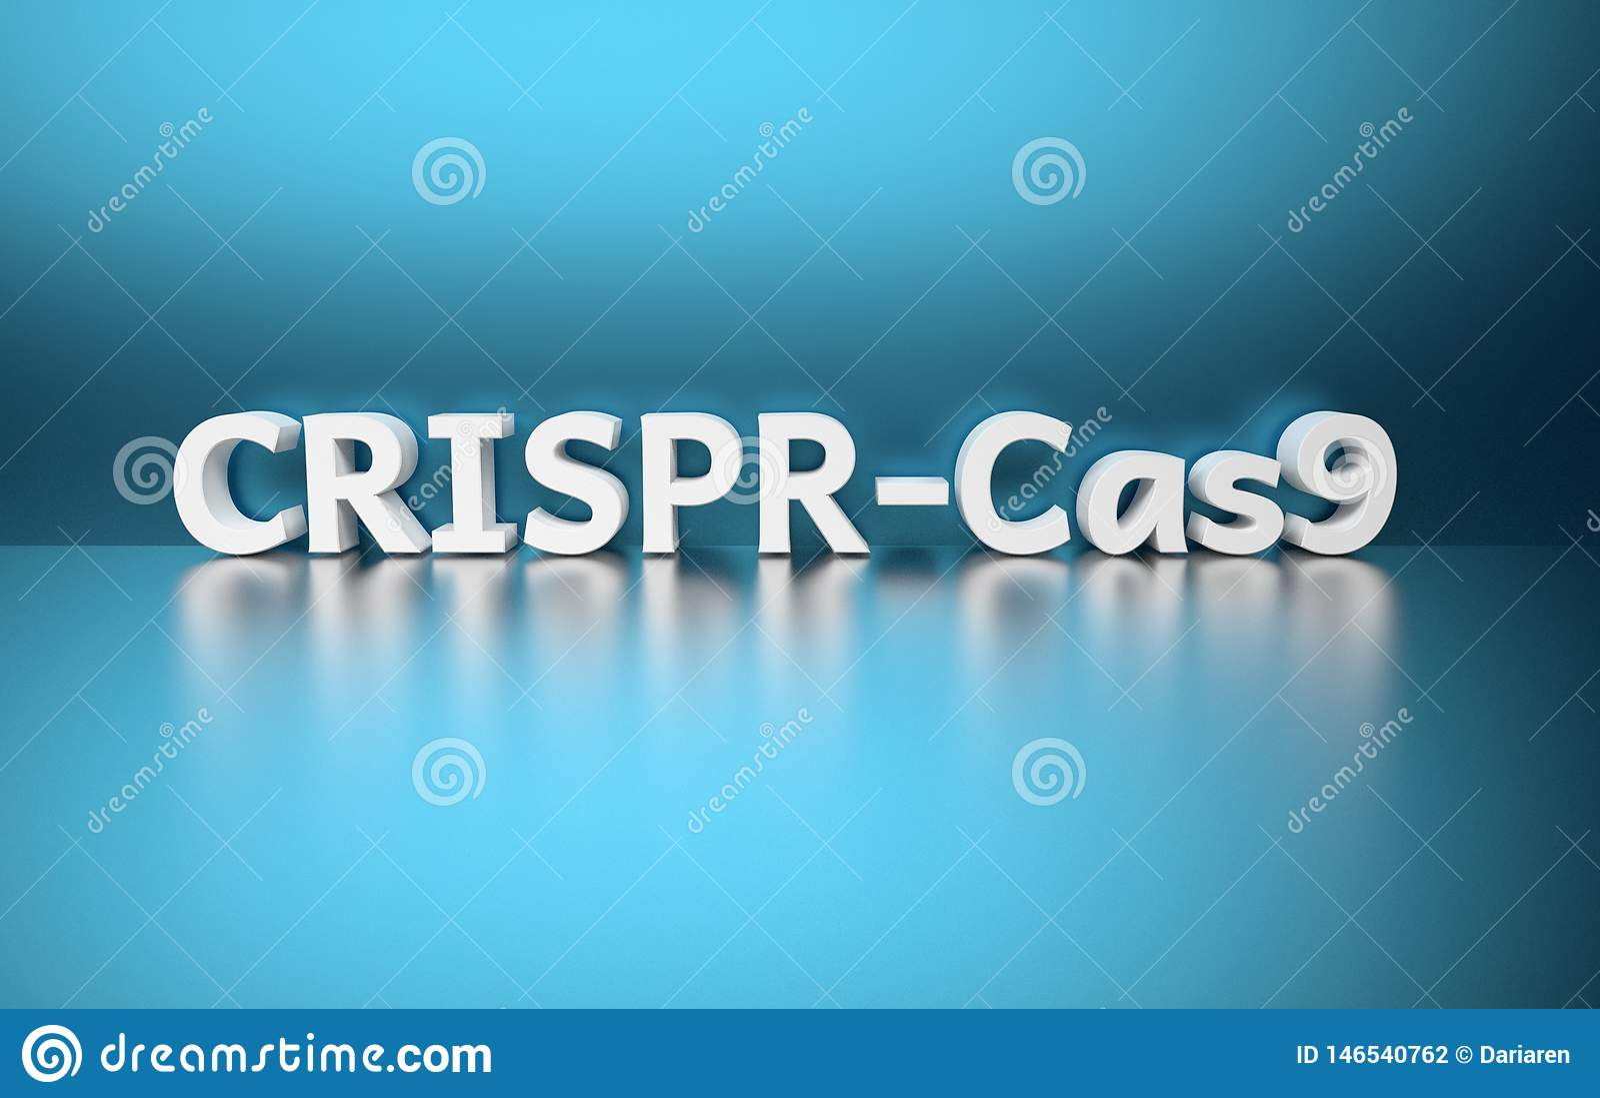 Palabra CRISPR-Cas9 en fondo azul